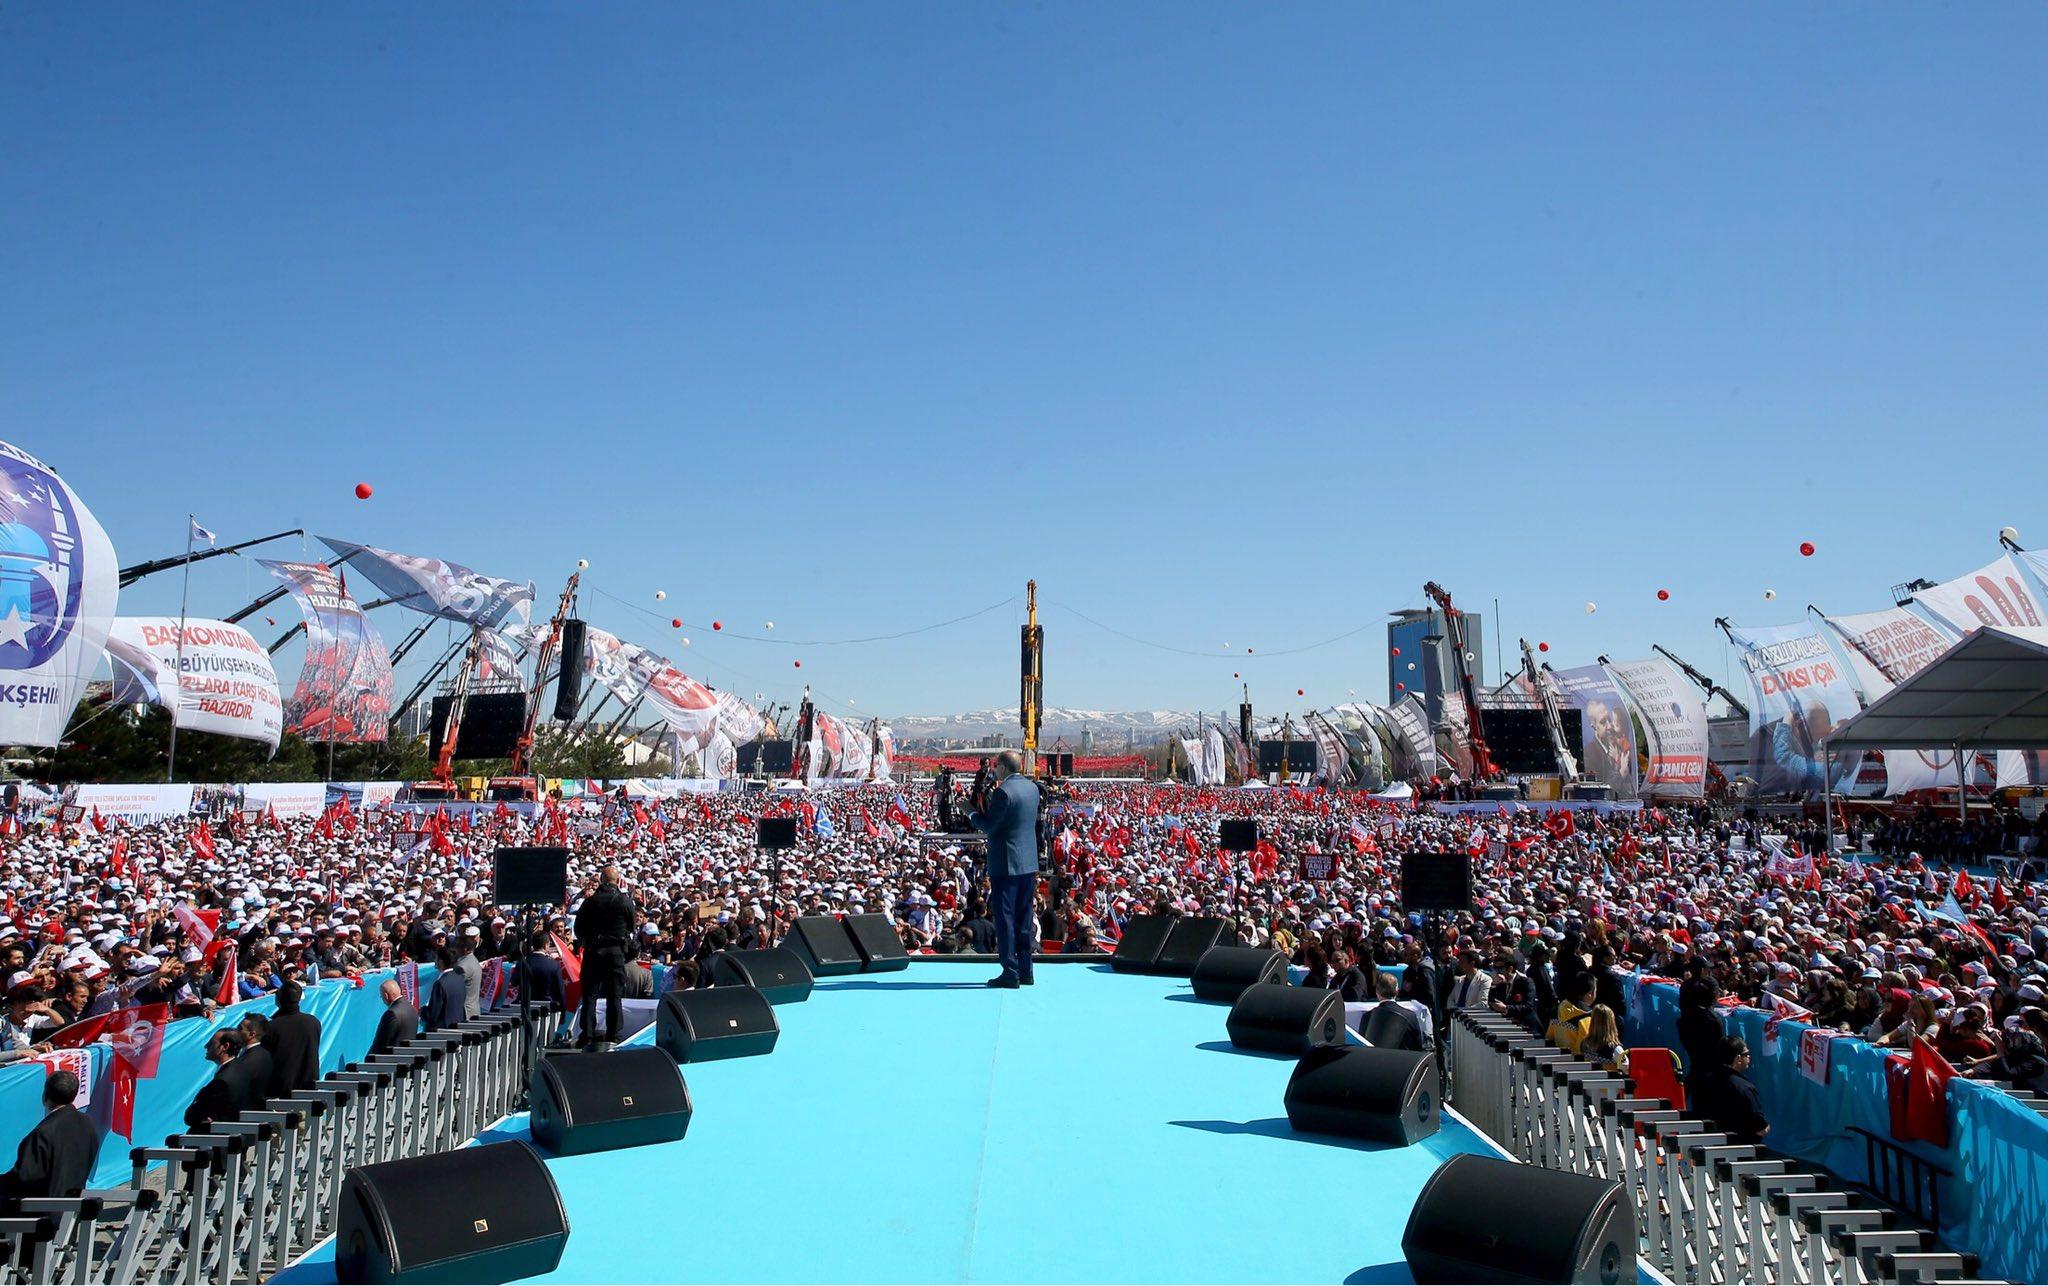 Teşekkürler Ankara! https://t.co/mnRanIzvSp